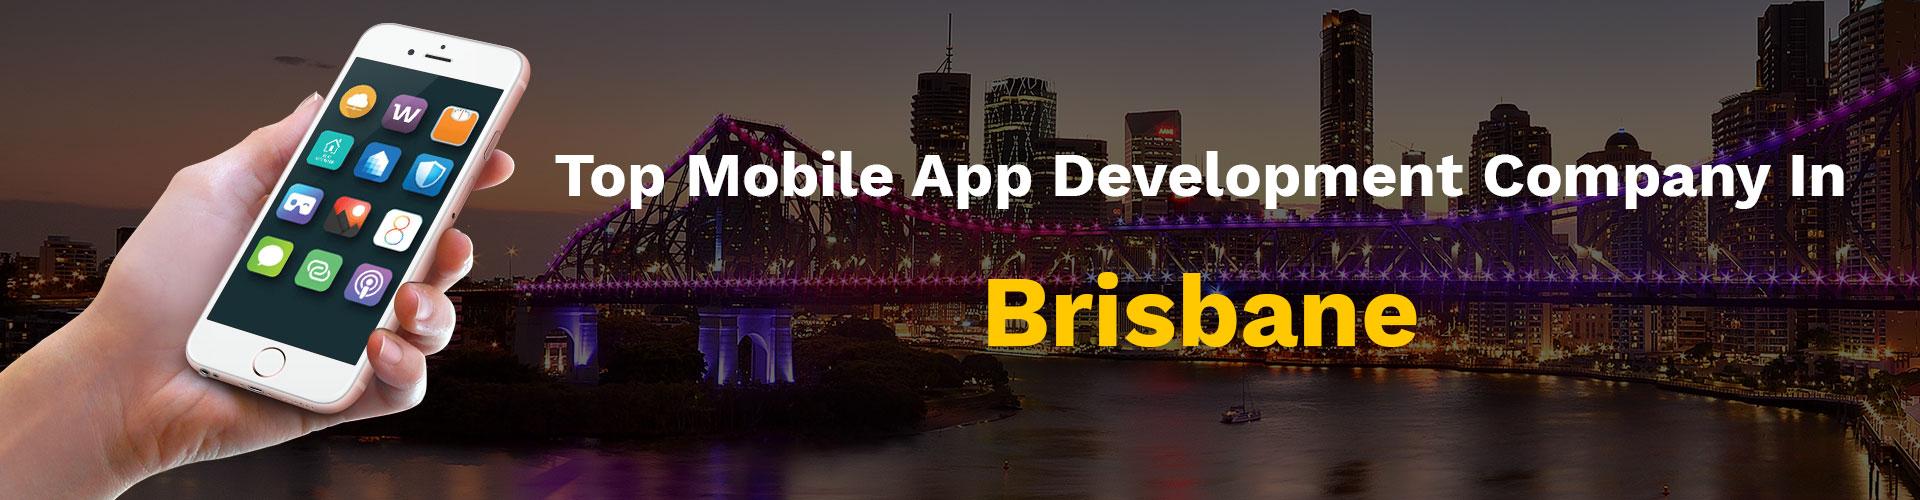 mobile app development company brisbane